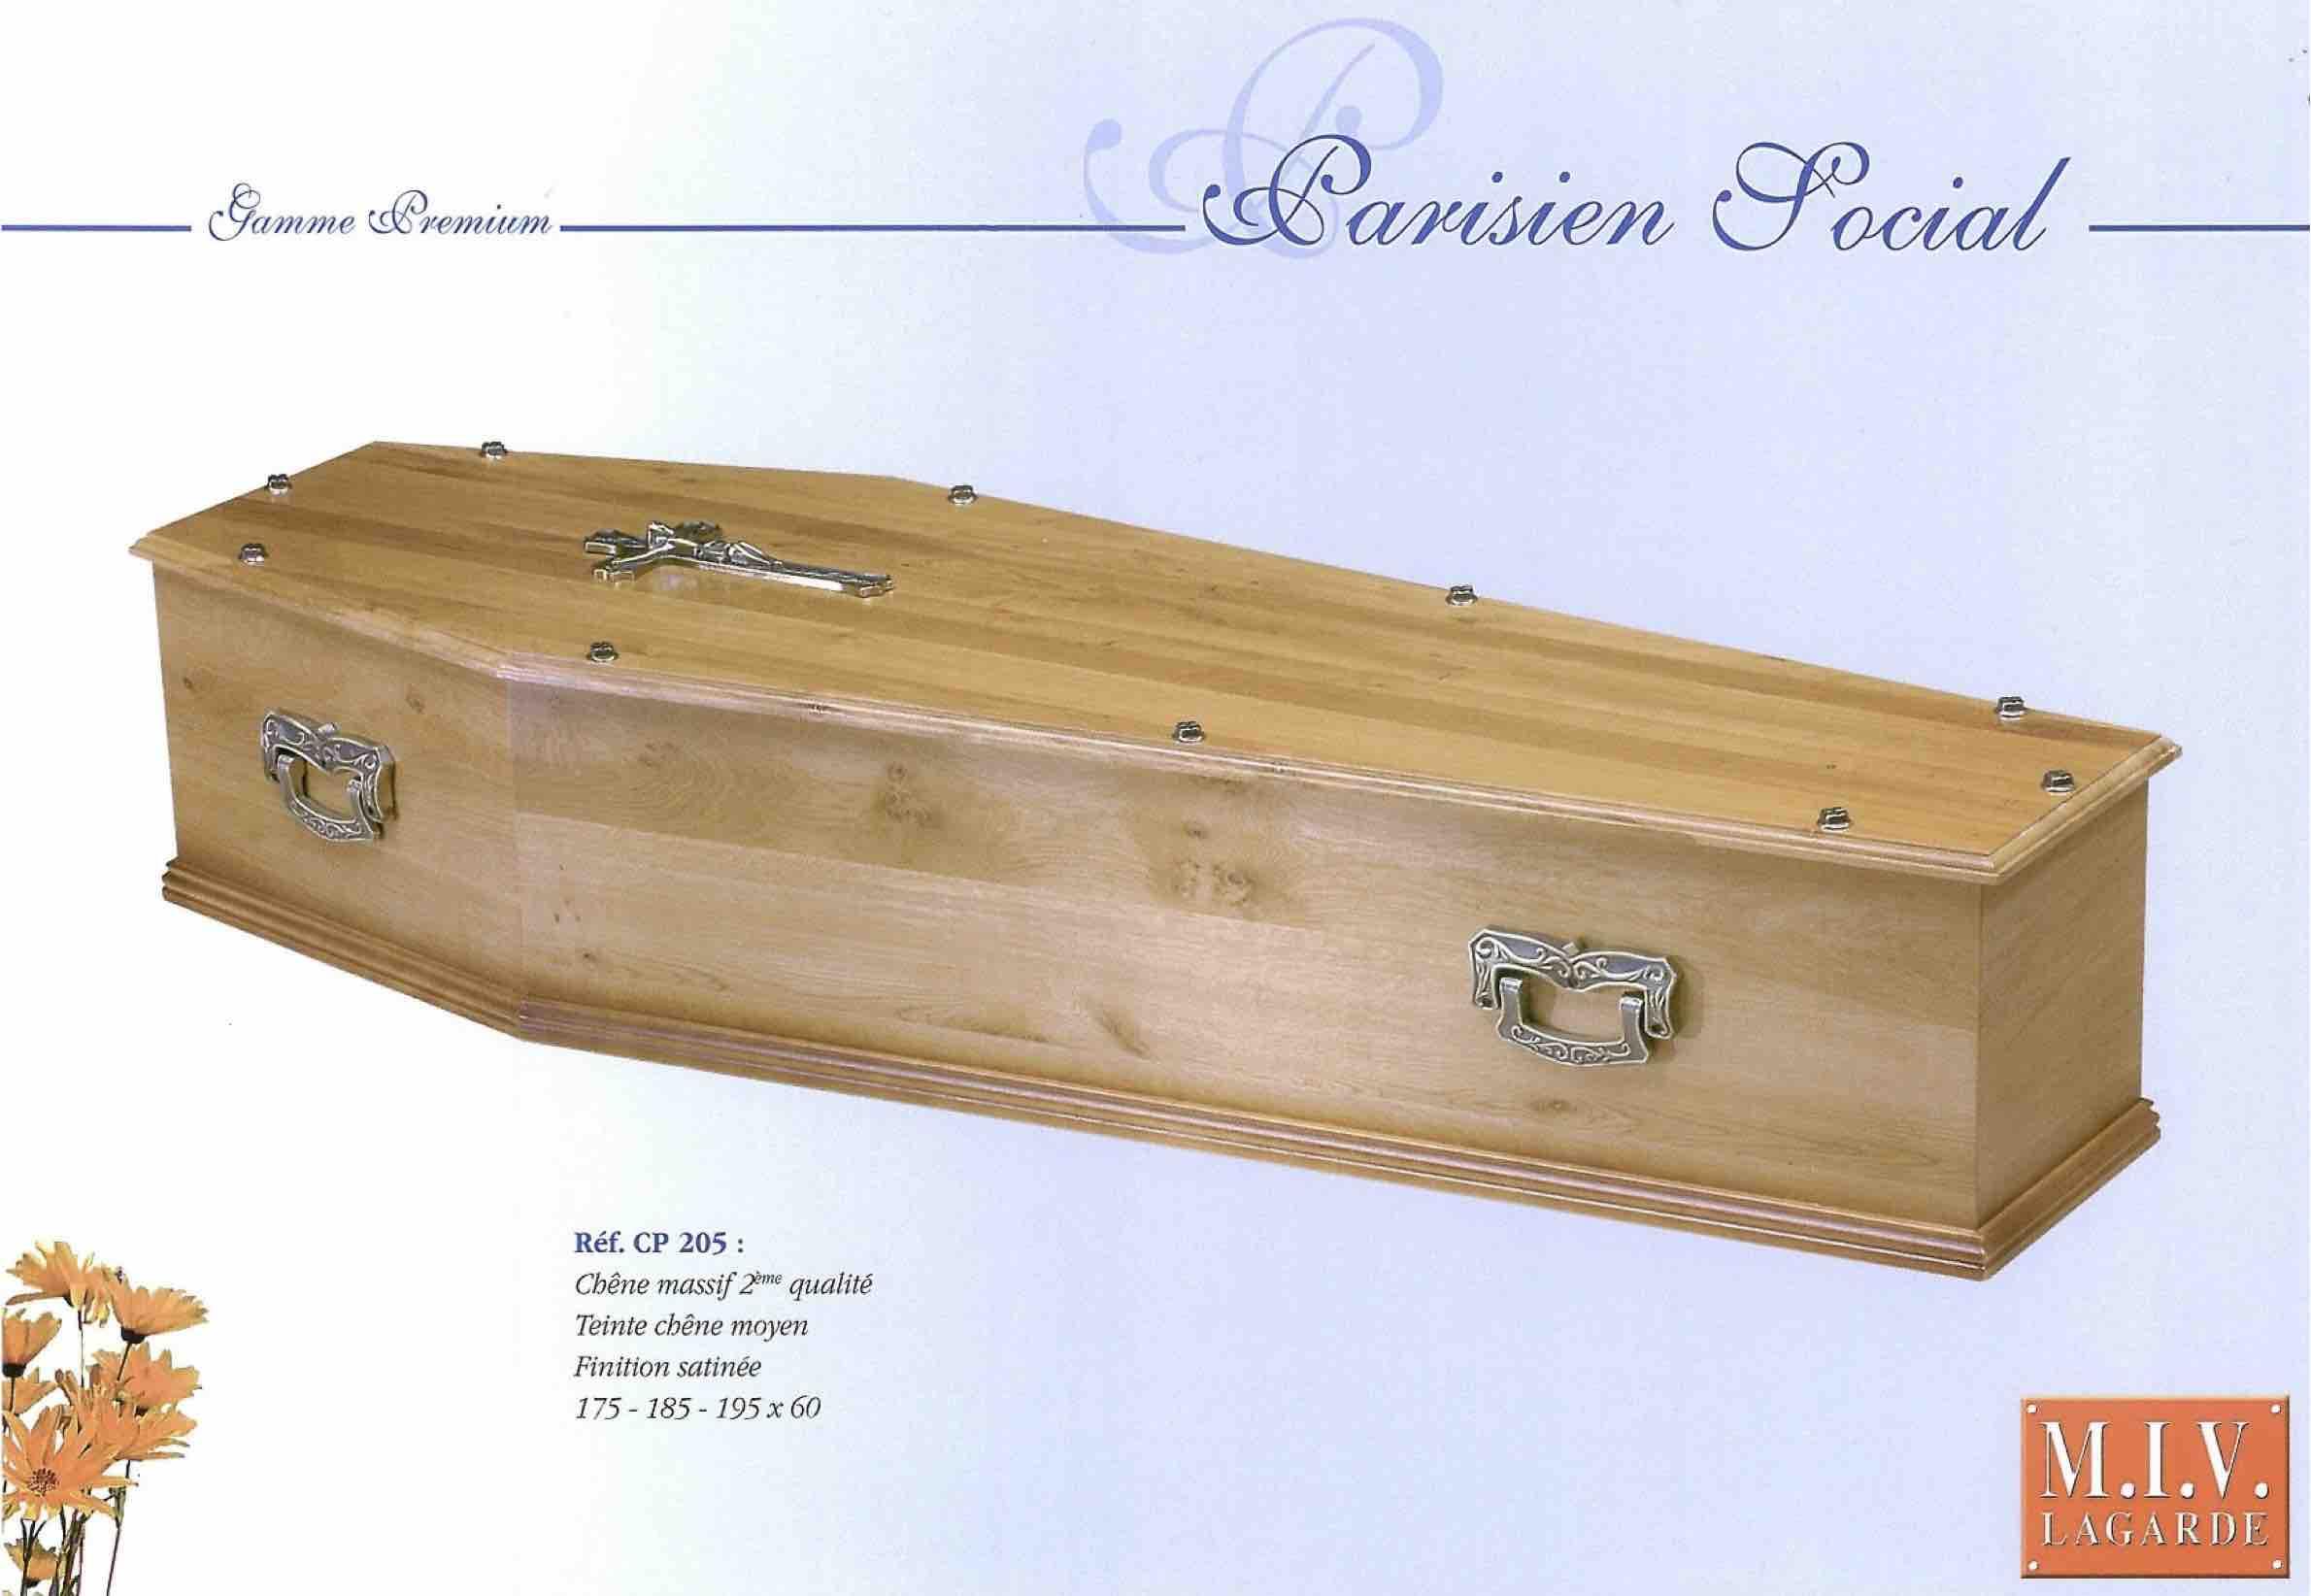 cercueil-inhumation-social